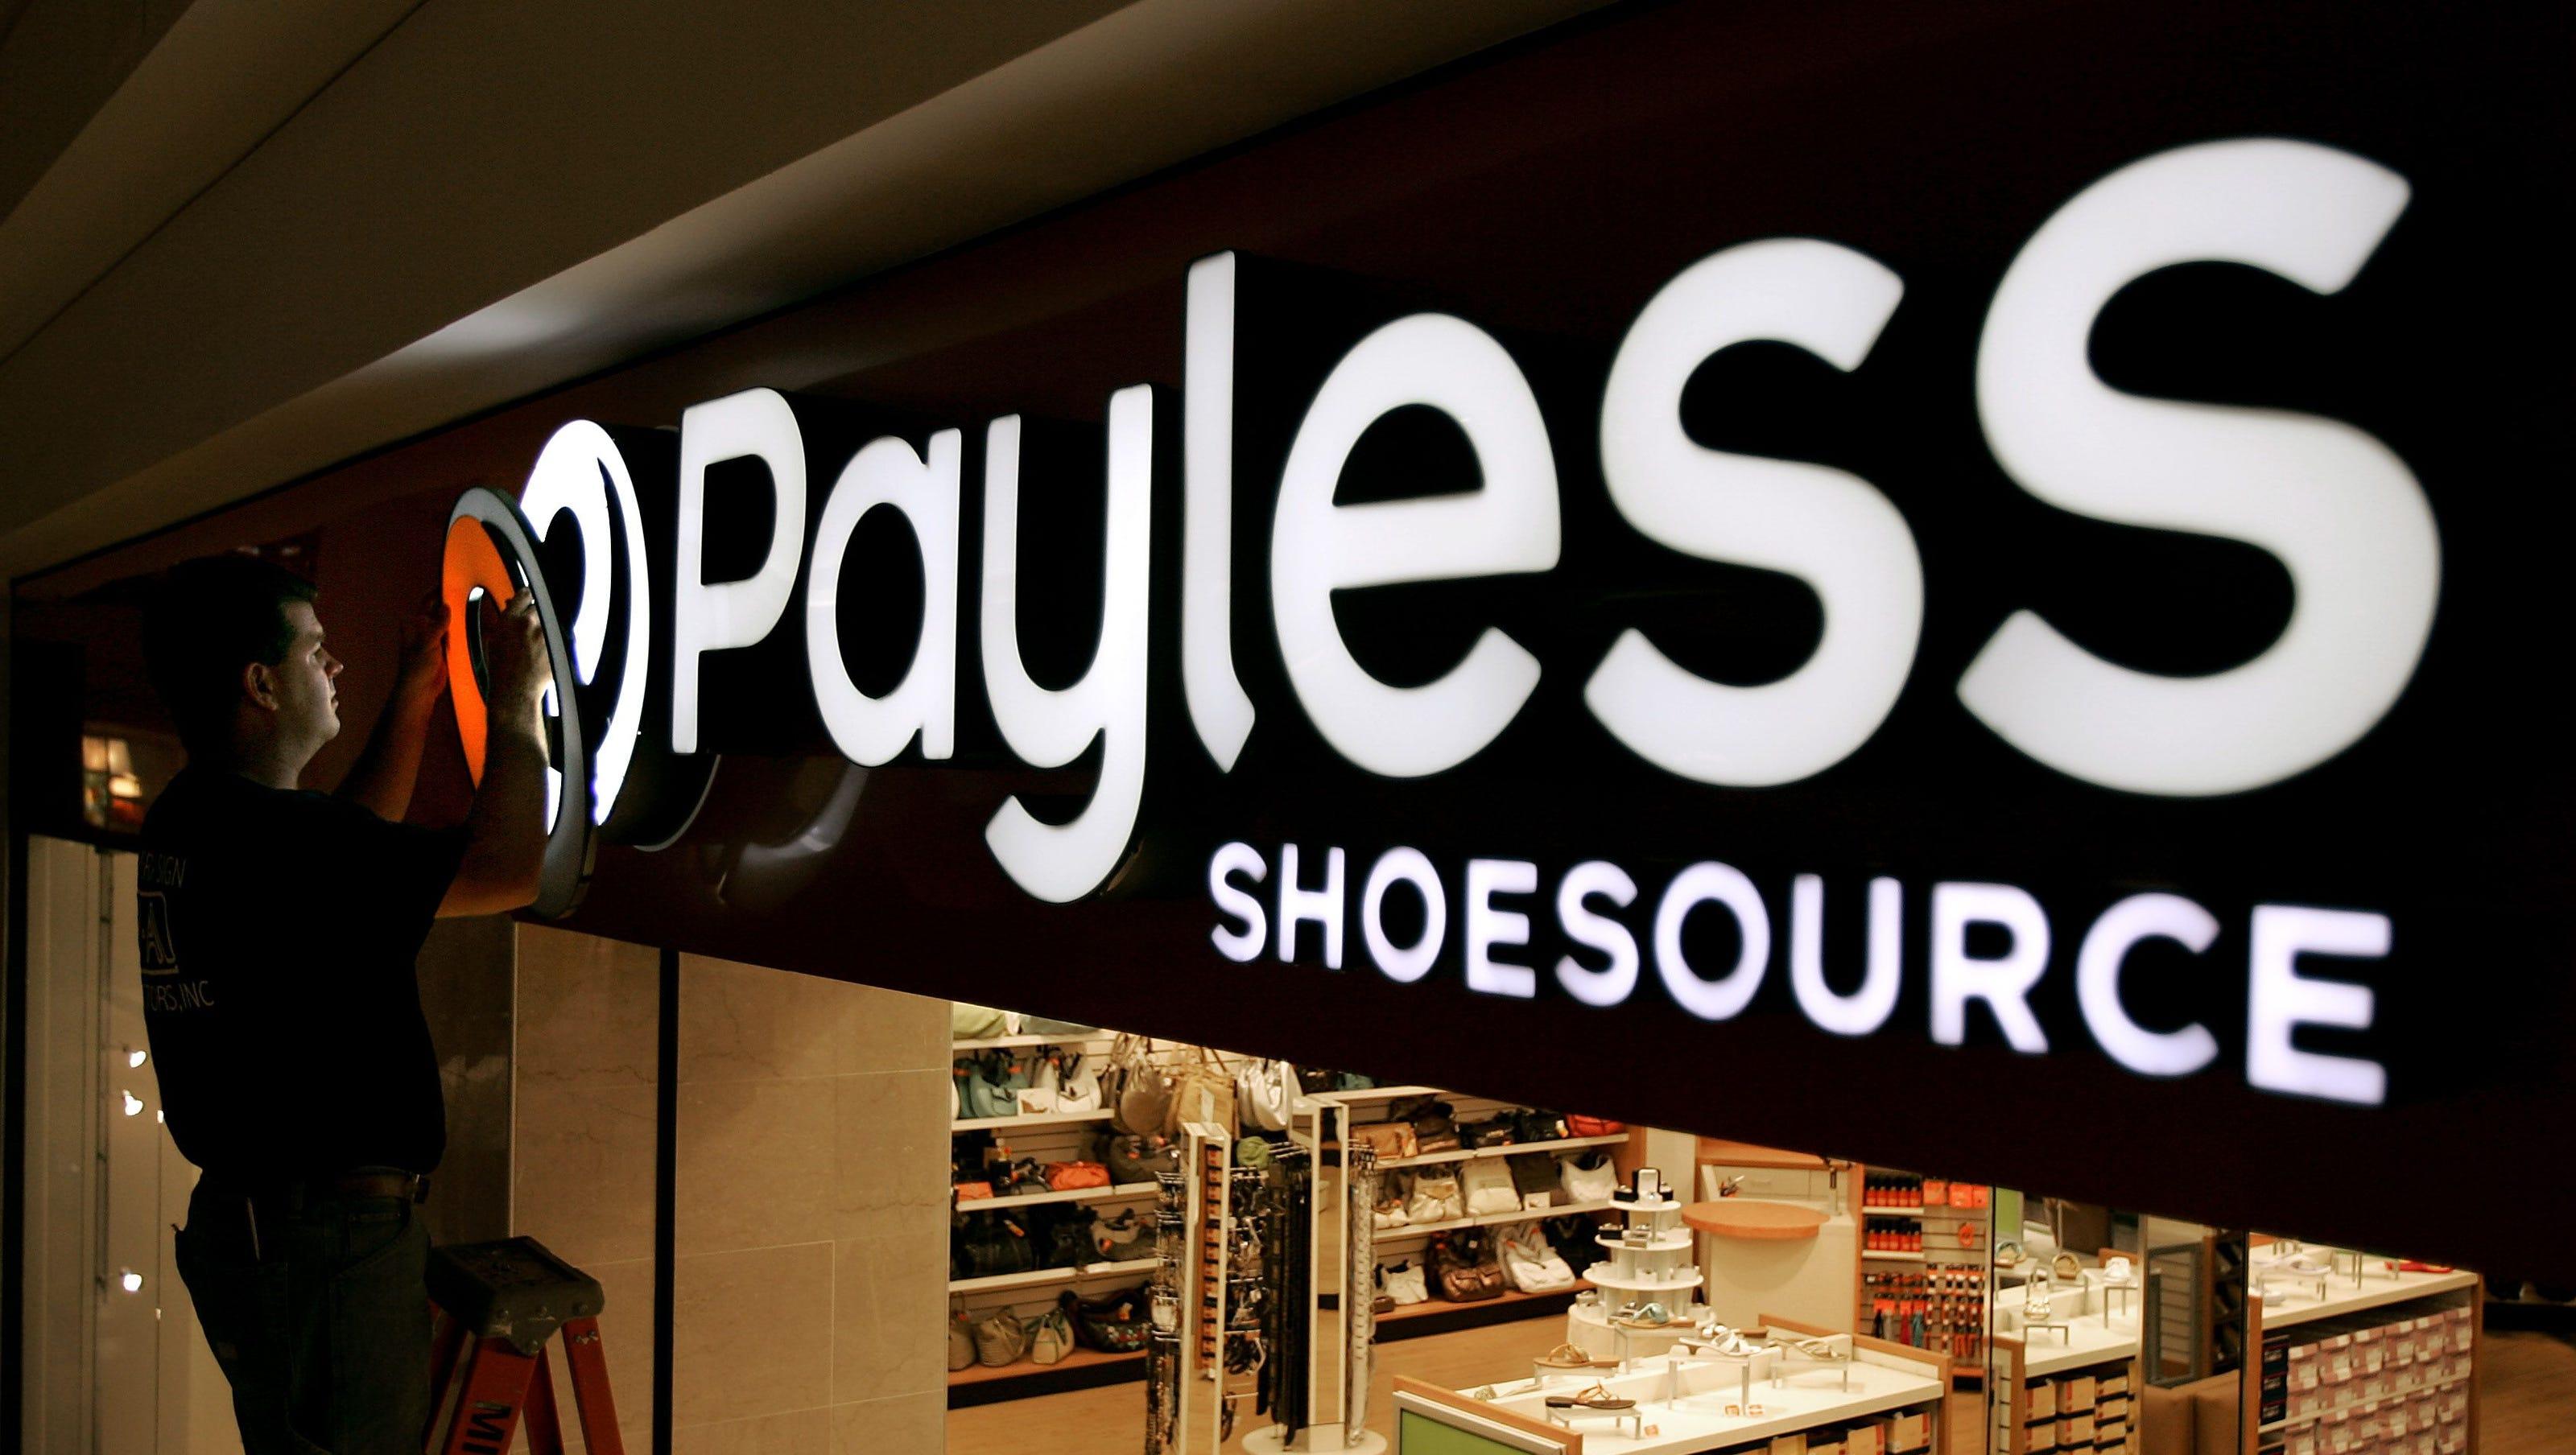 Payless Shoesource Shoe